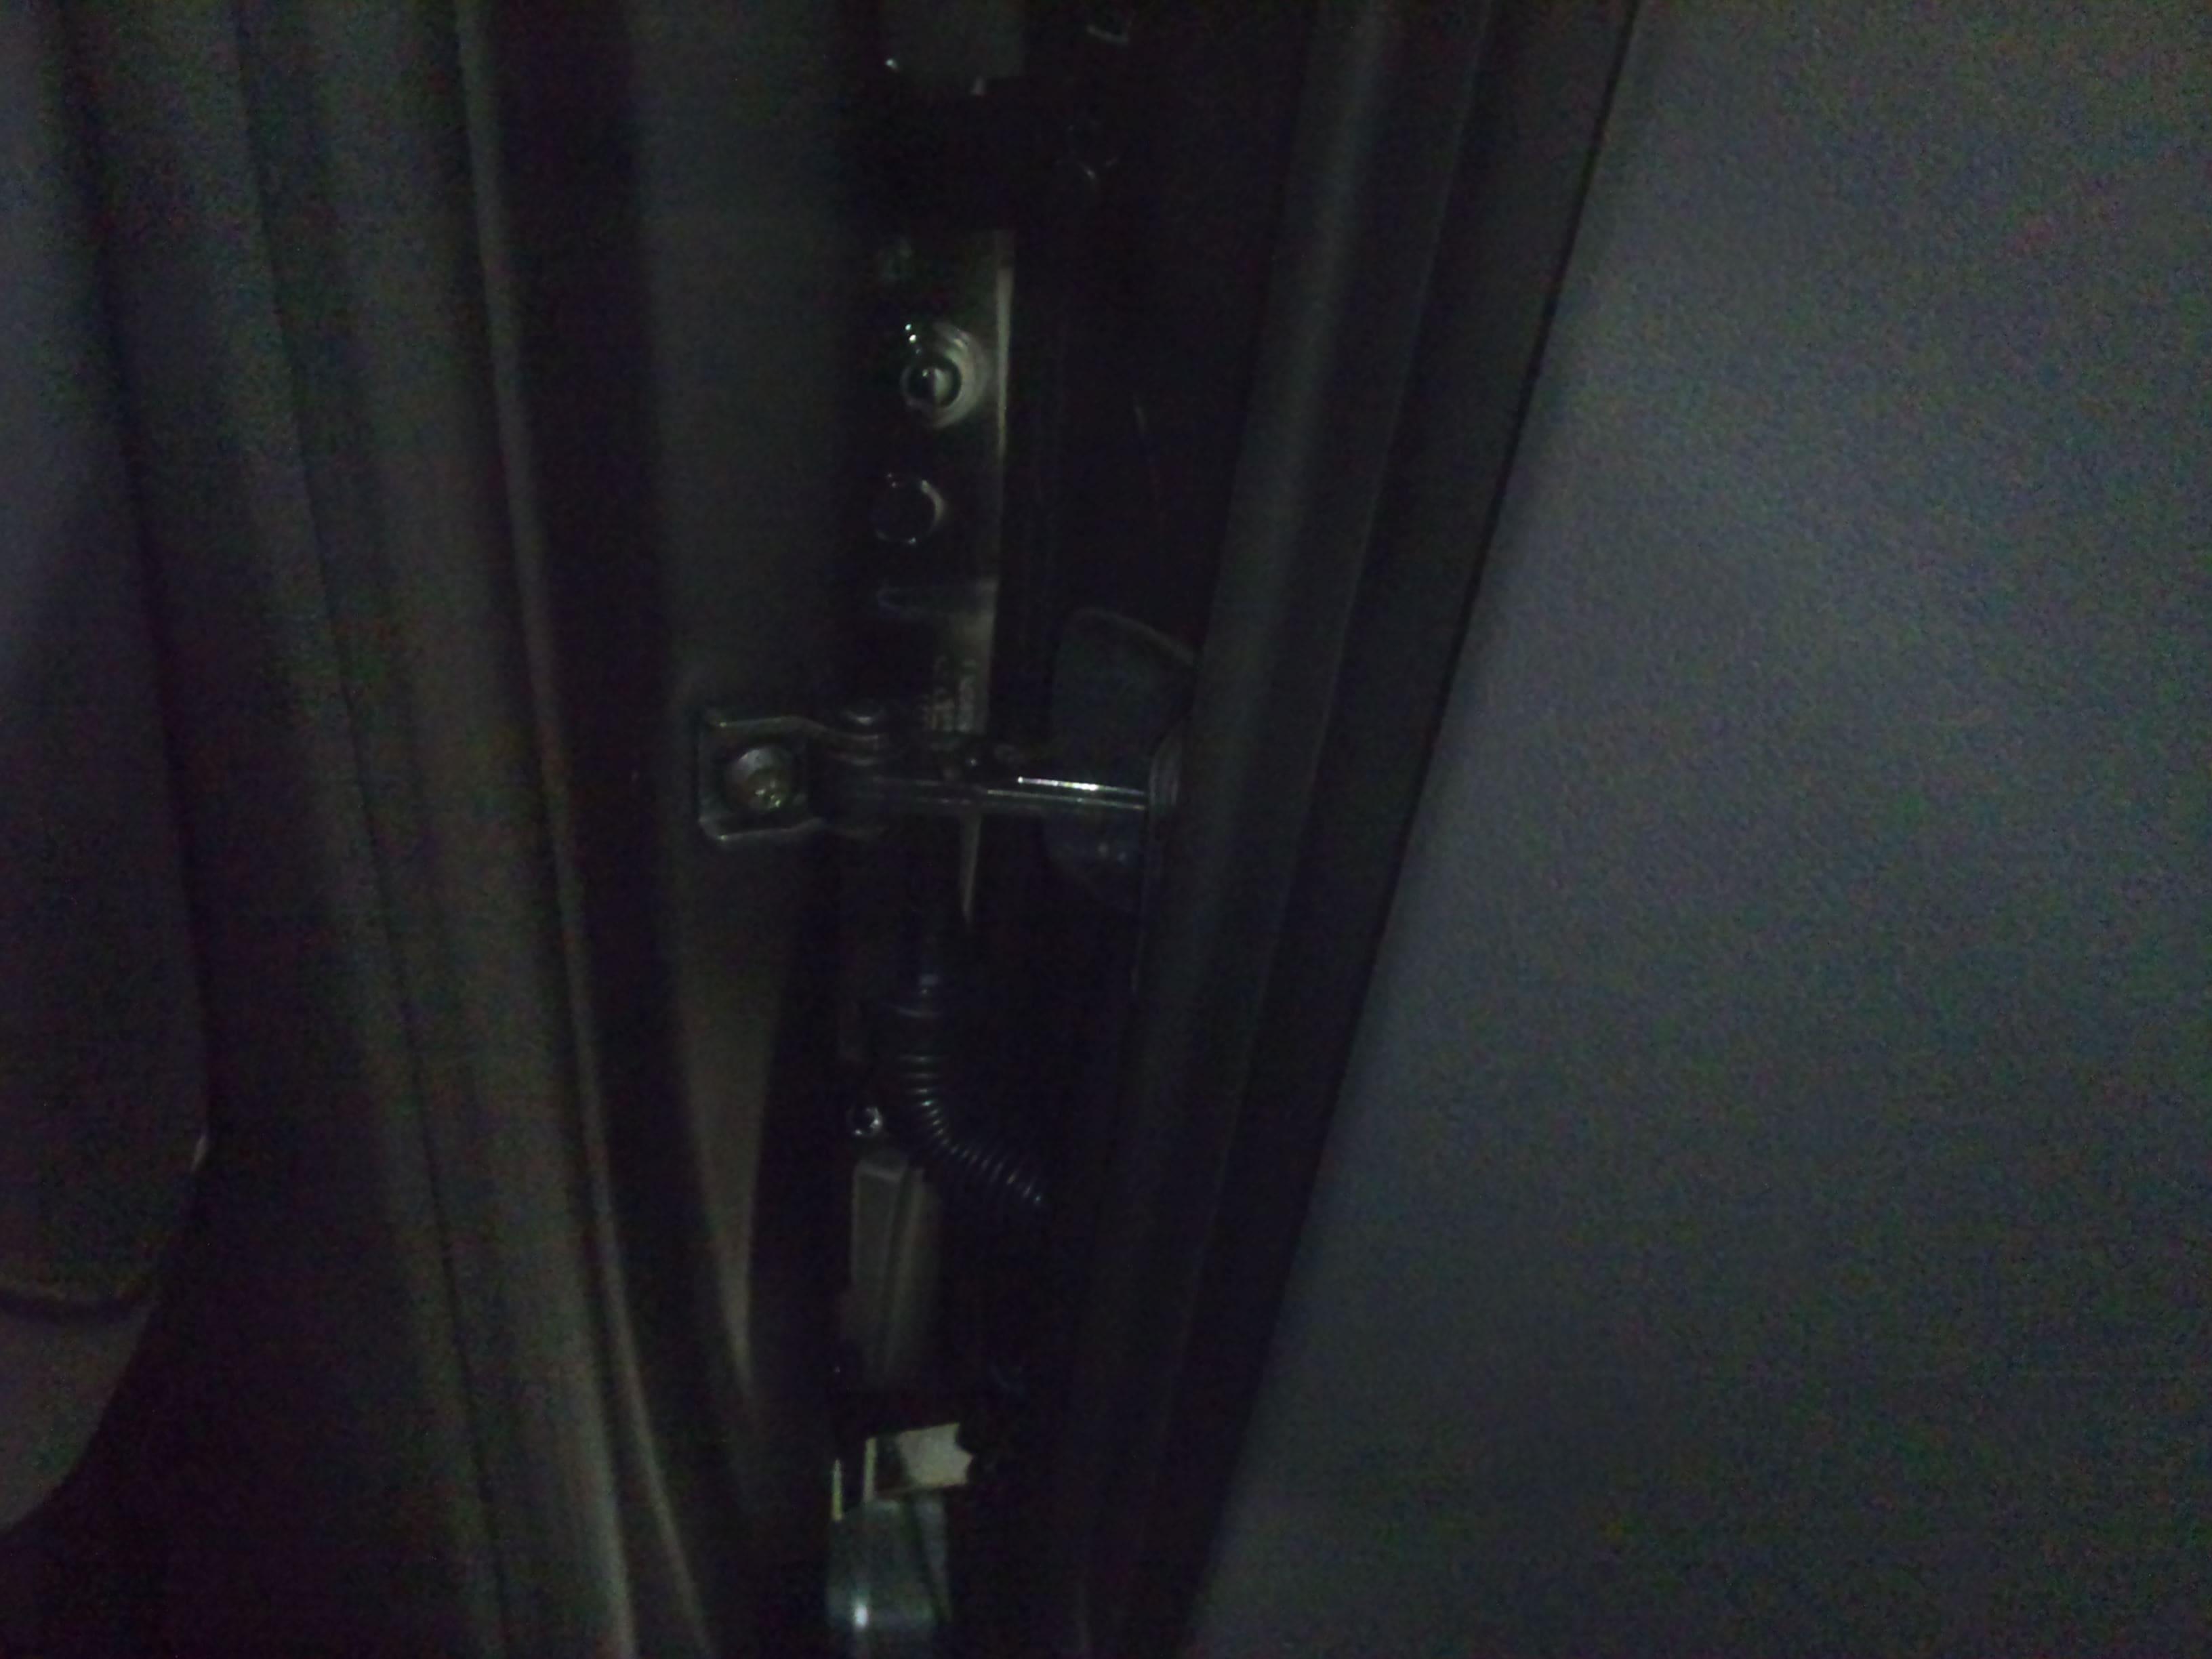 Audi A5 Coupe met Mat Zwarte Wrap, Carwrapping door Wrapmyride.nu Foto-nr:4567, ©2021